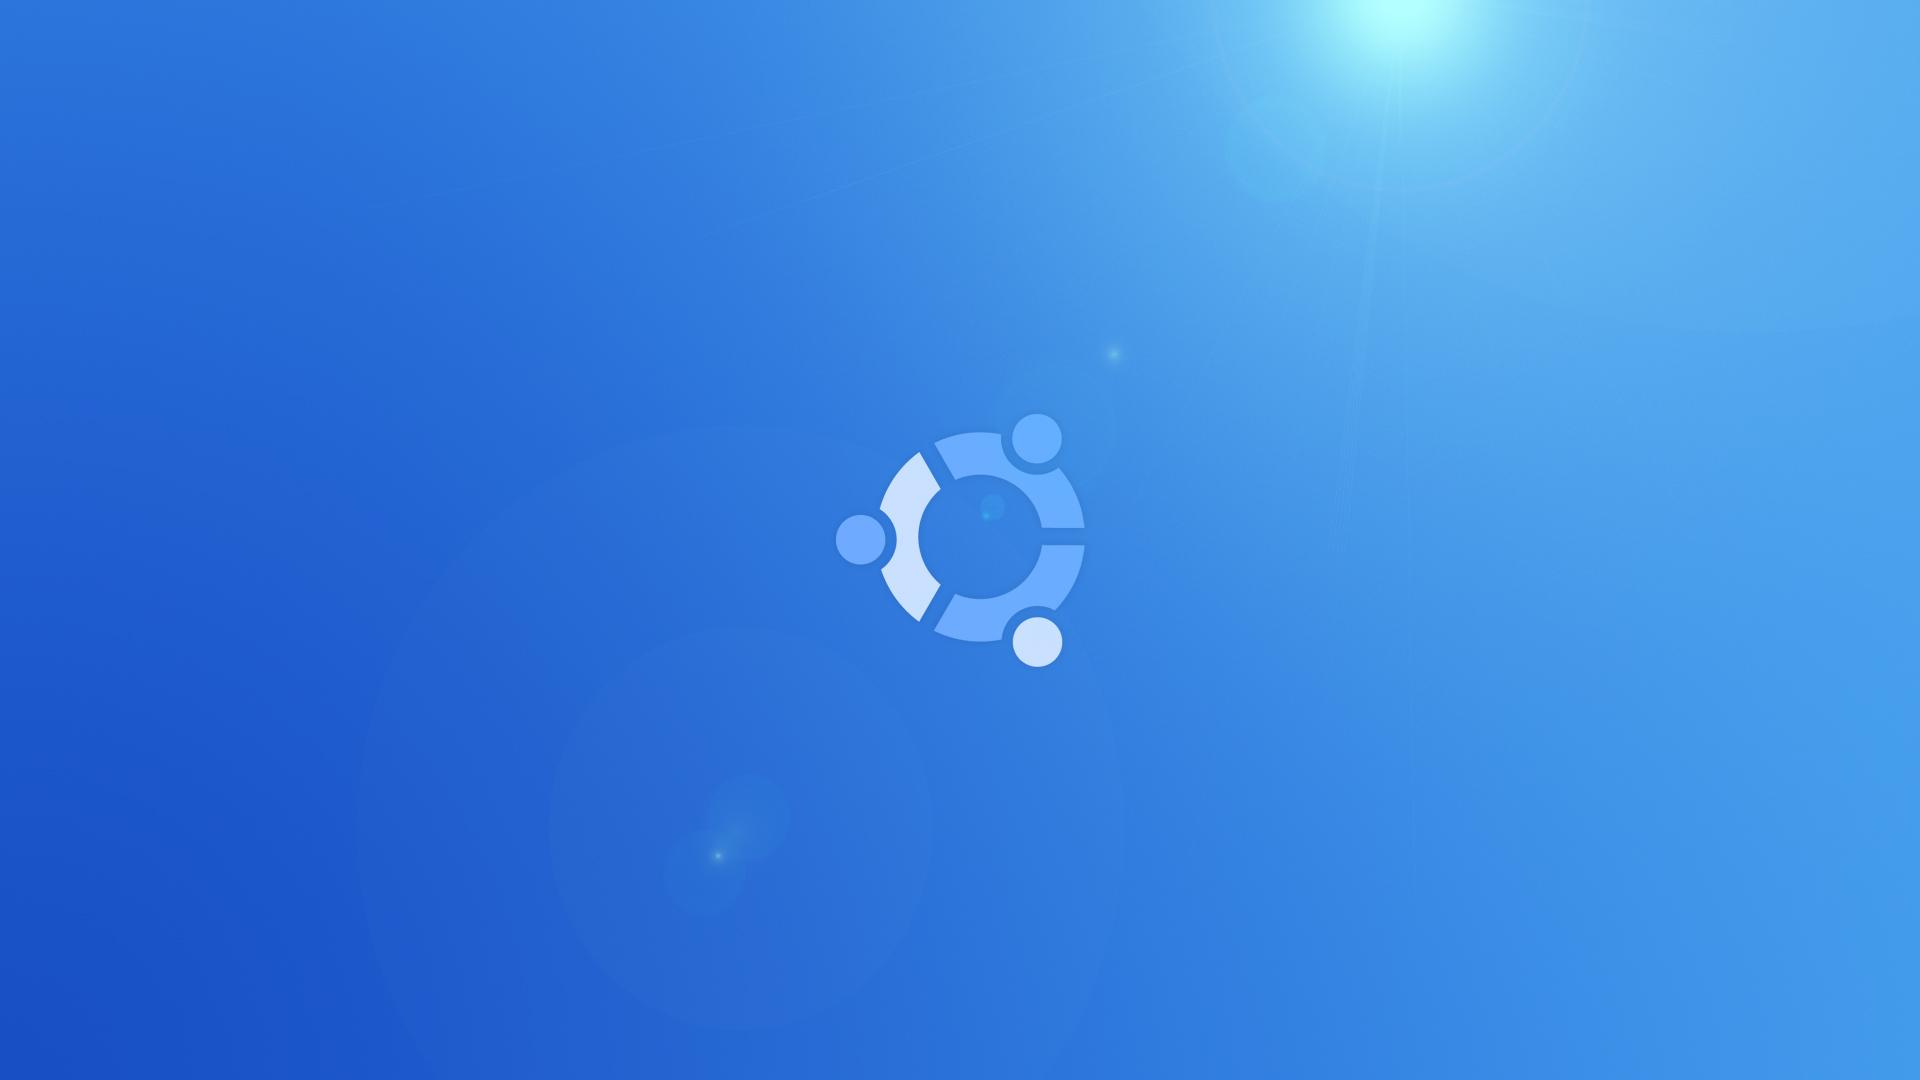 Blue Screen Of Death Linux Ubuntu Simple Wallpaper Wallpapers